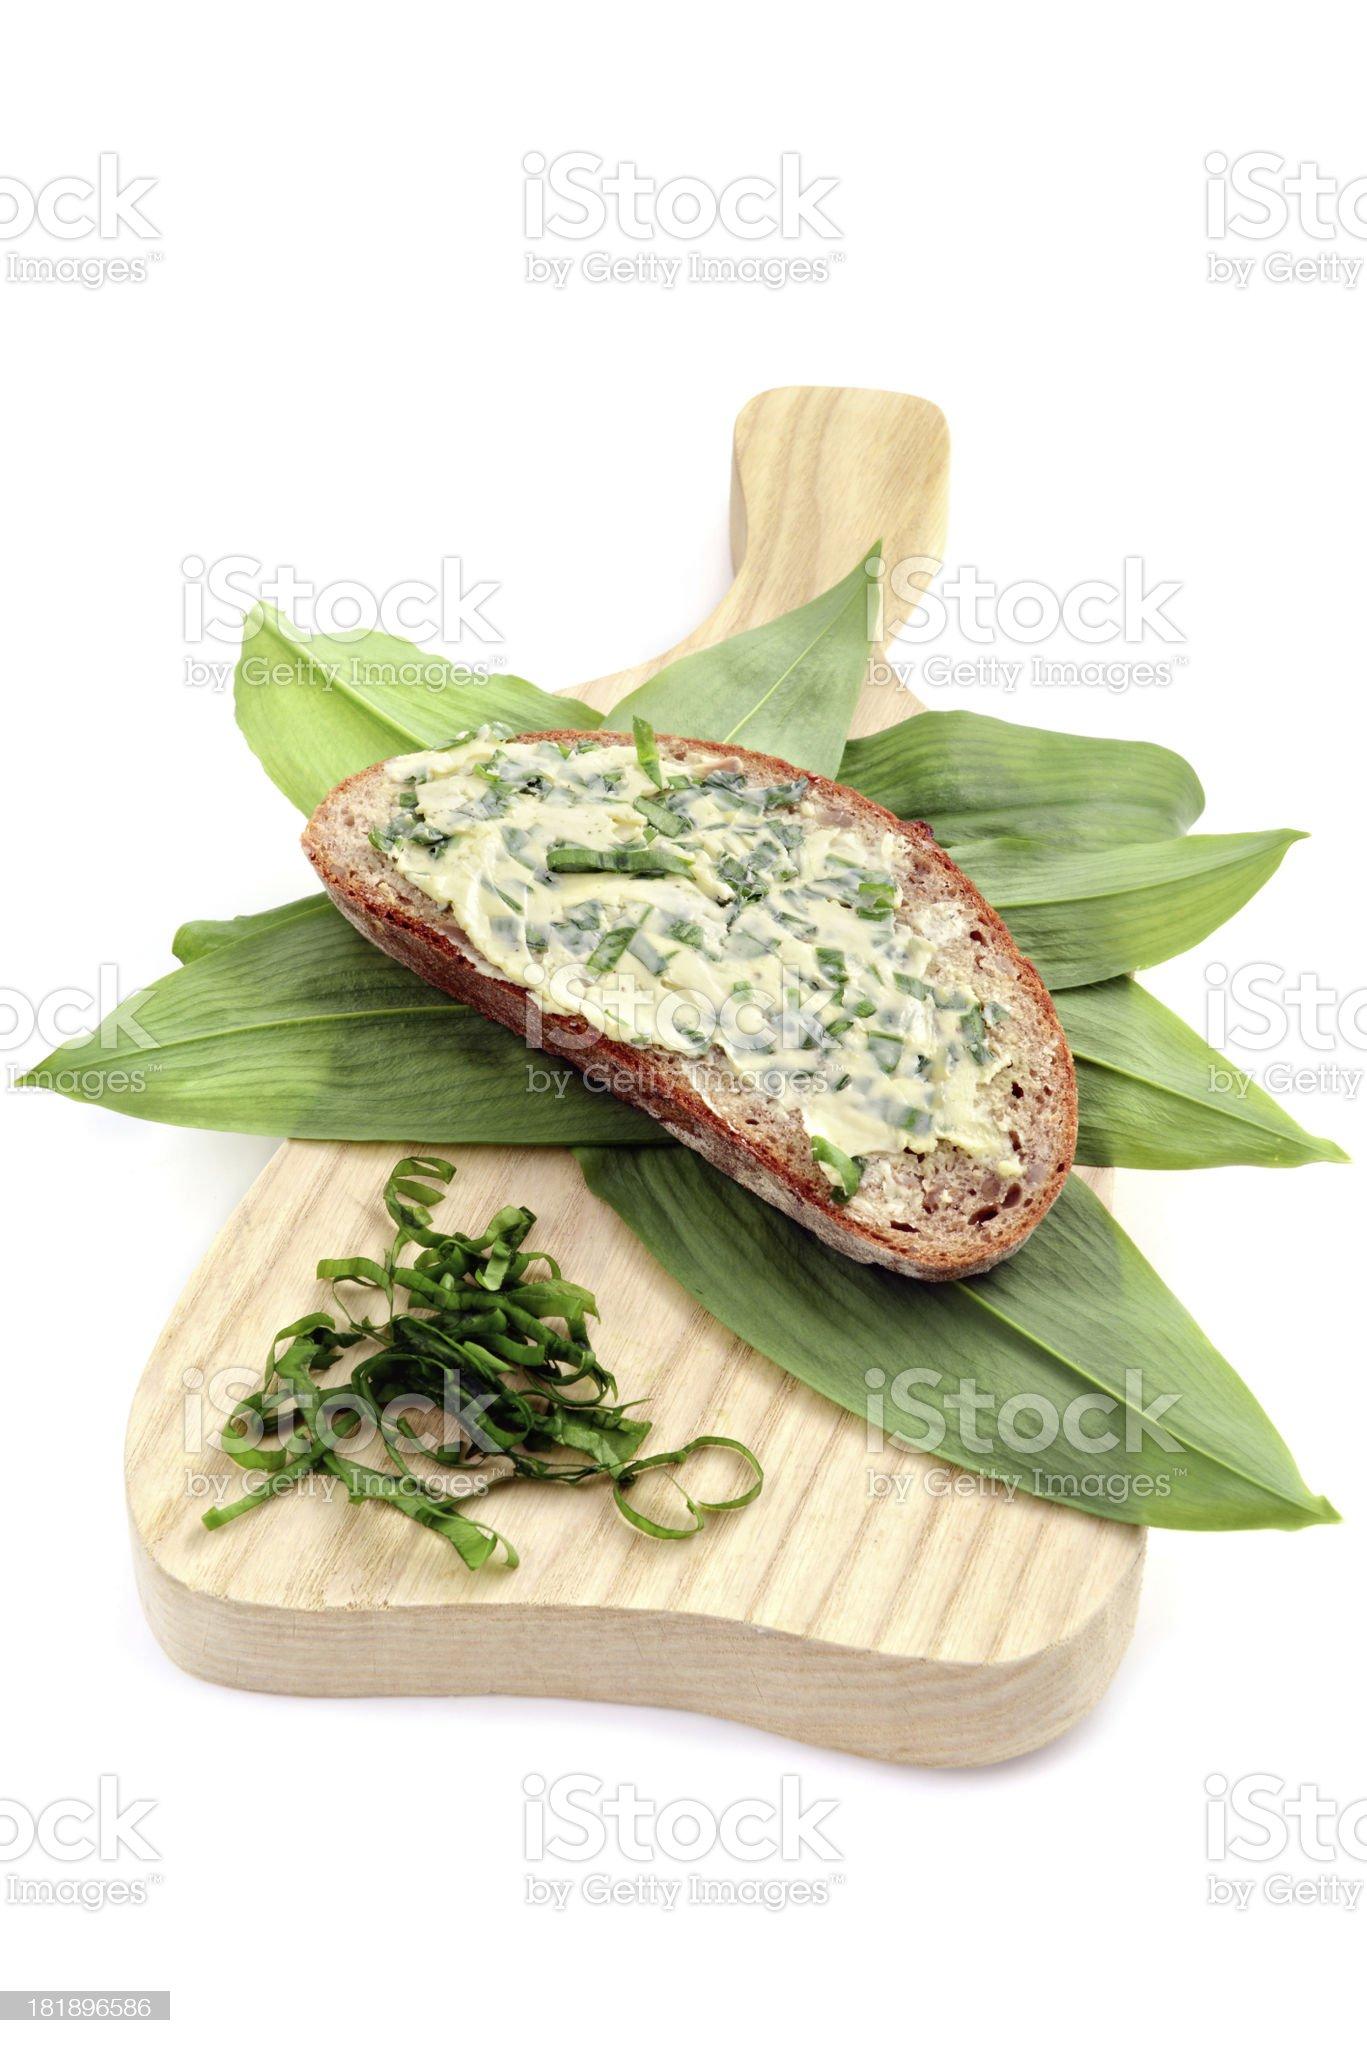 herb butter wild garlic (Allium ursinum) on slice of bread royalty-free stock photo